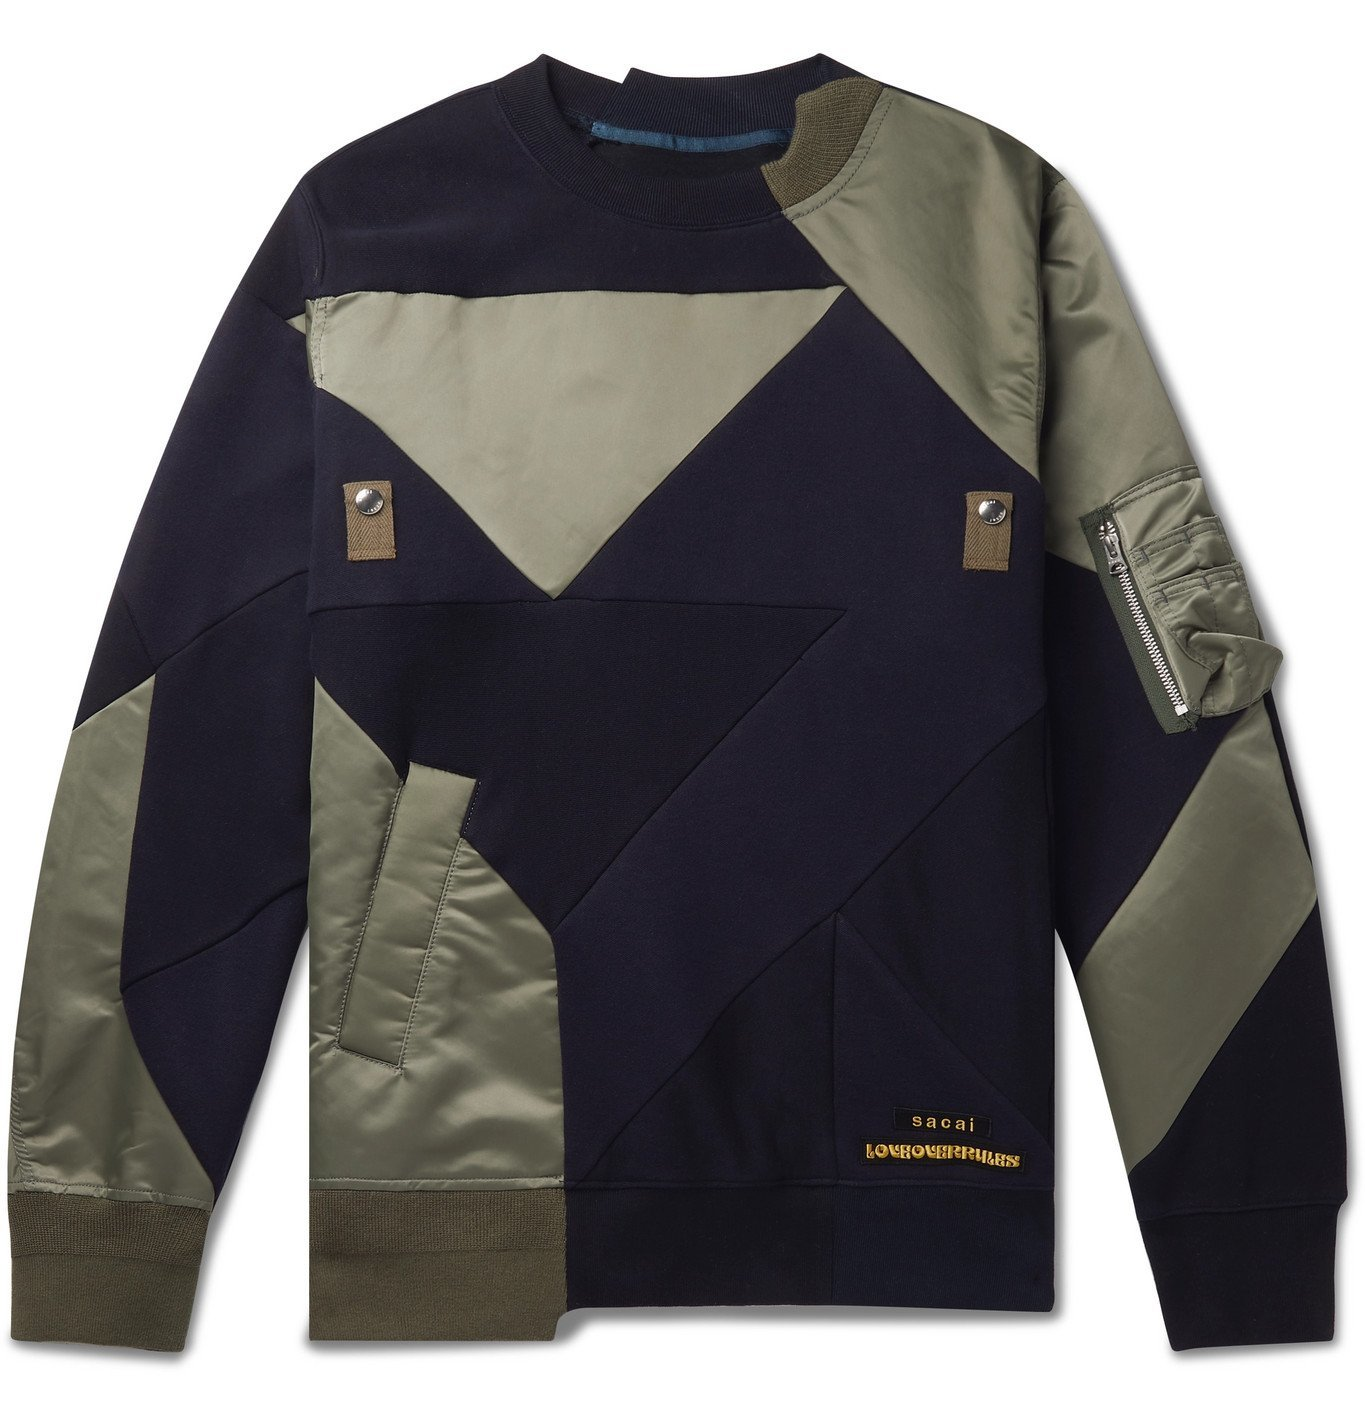 Sacai - Hank Willis Thomas Logo-Appliquéd Patchwork Shell and Cotton-Jersey Sweatshirt - Multi